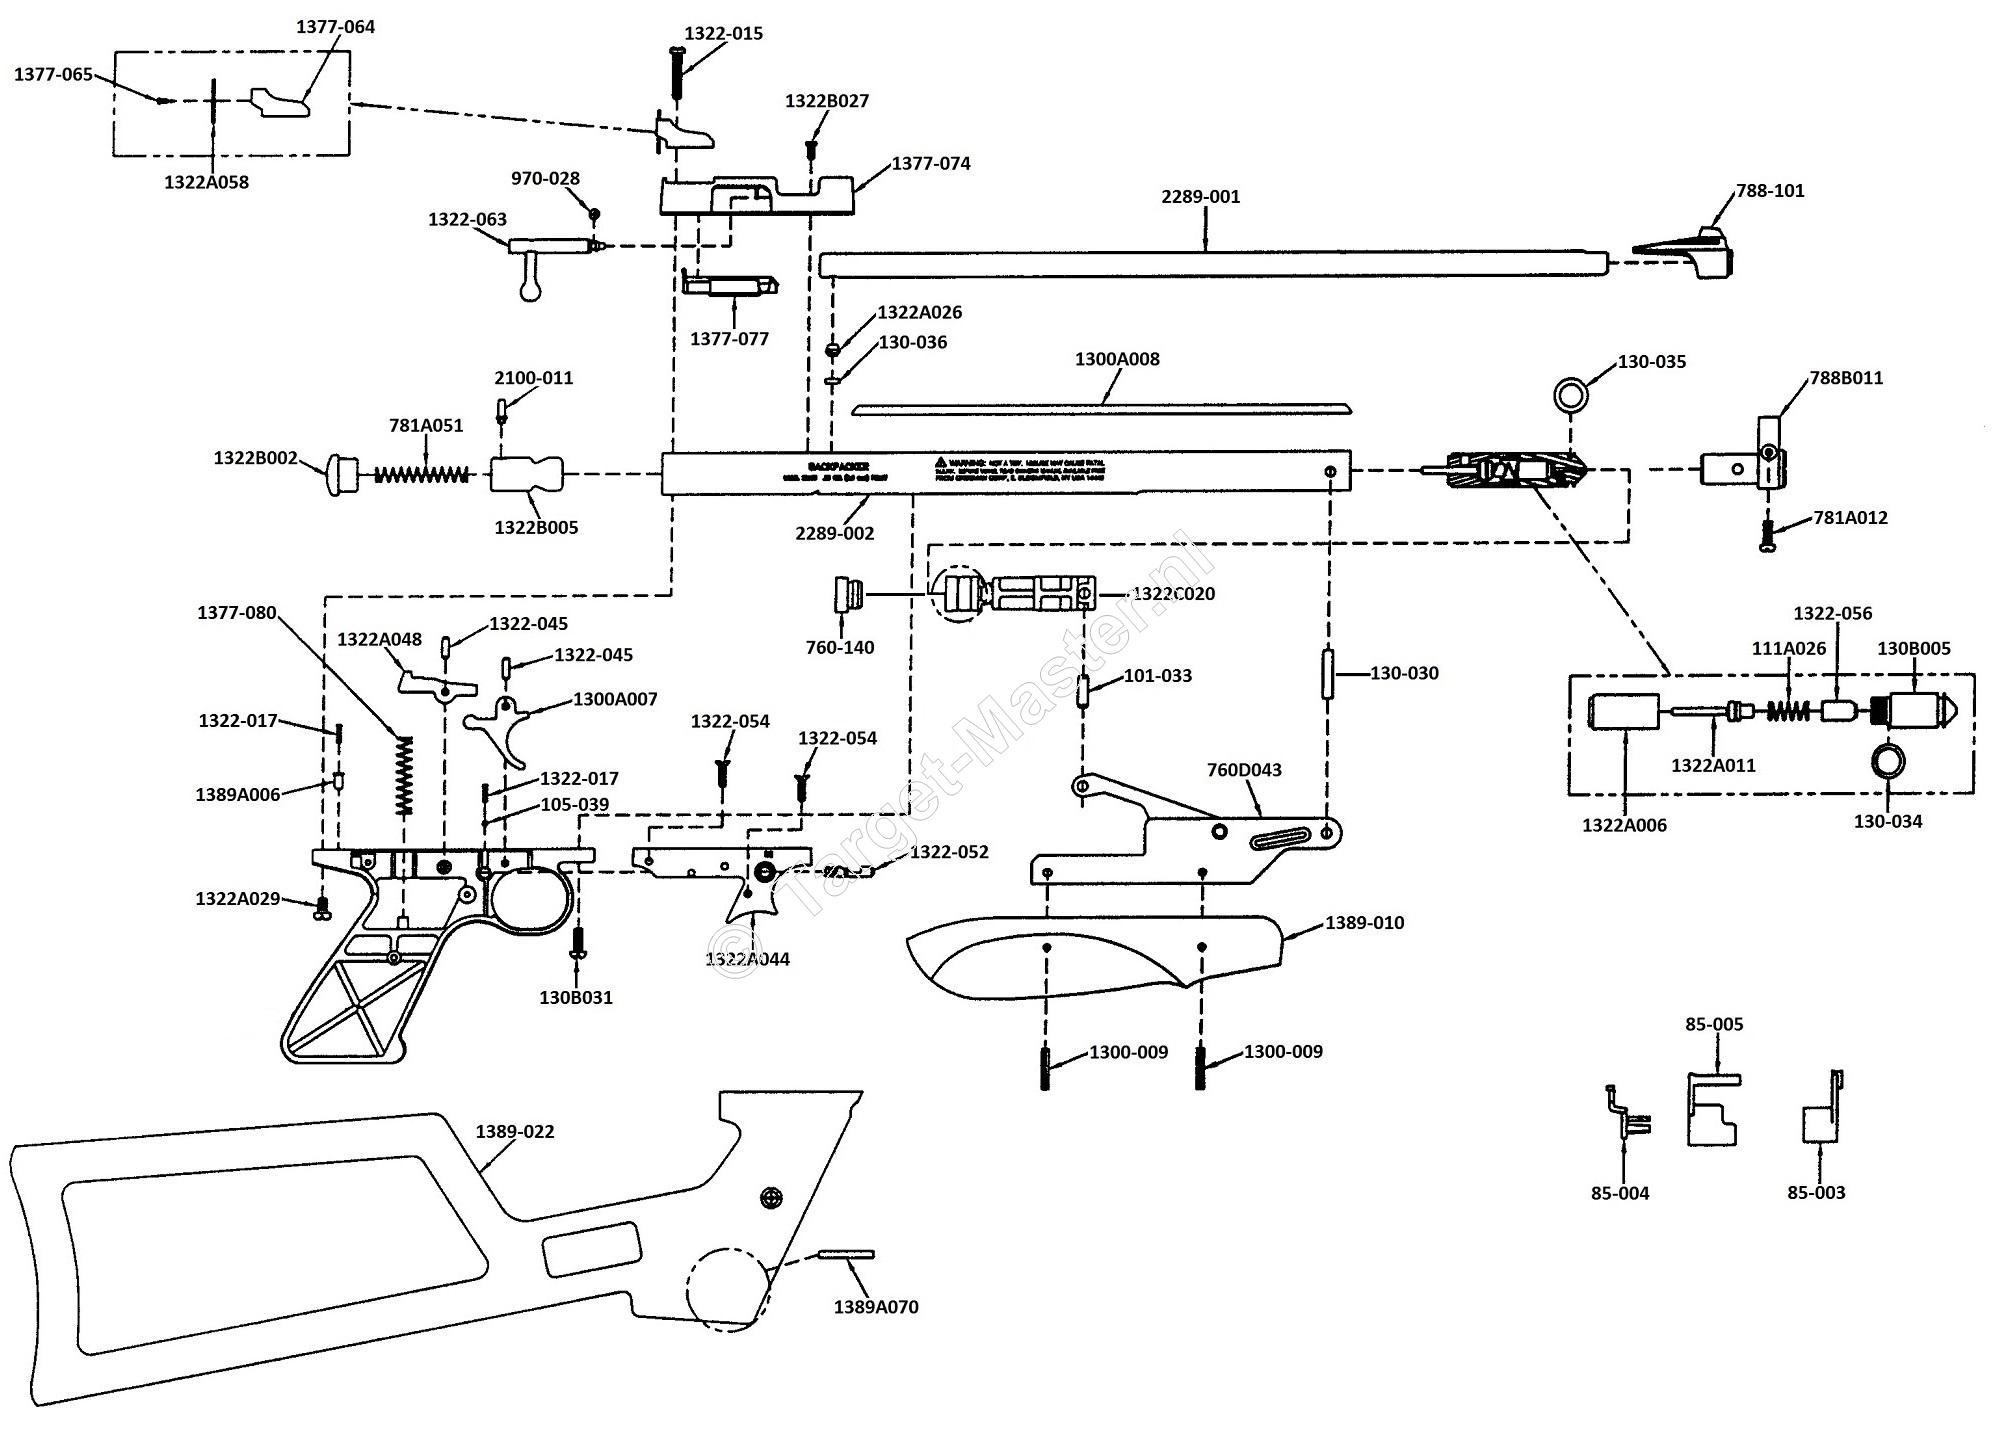 Crosman 1322 Parts Diagram Related Keywords & Suggestions - Crosman